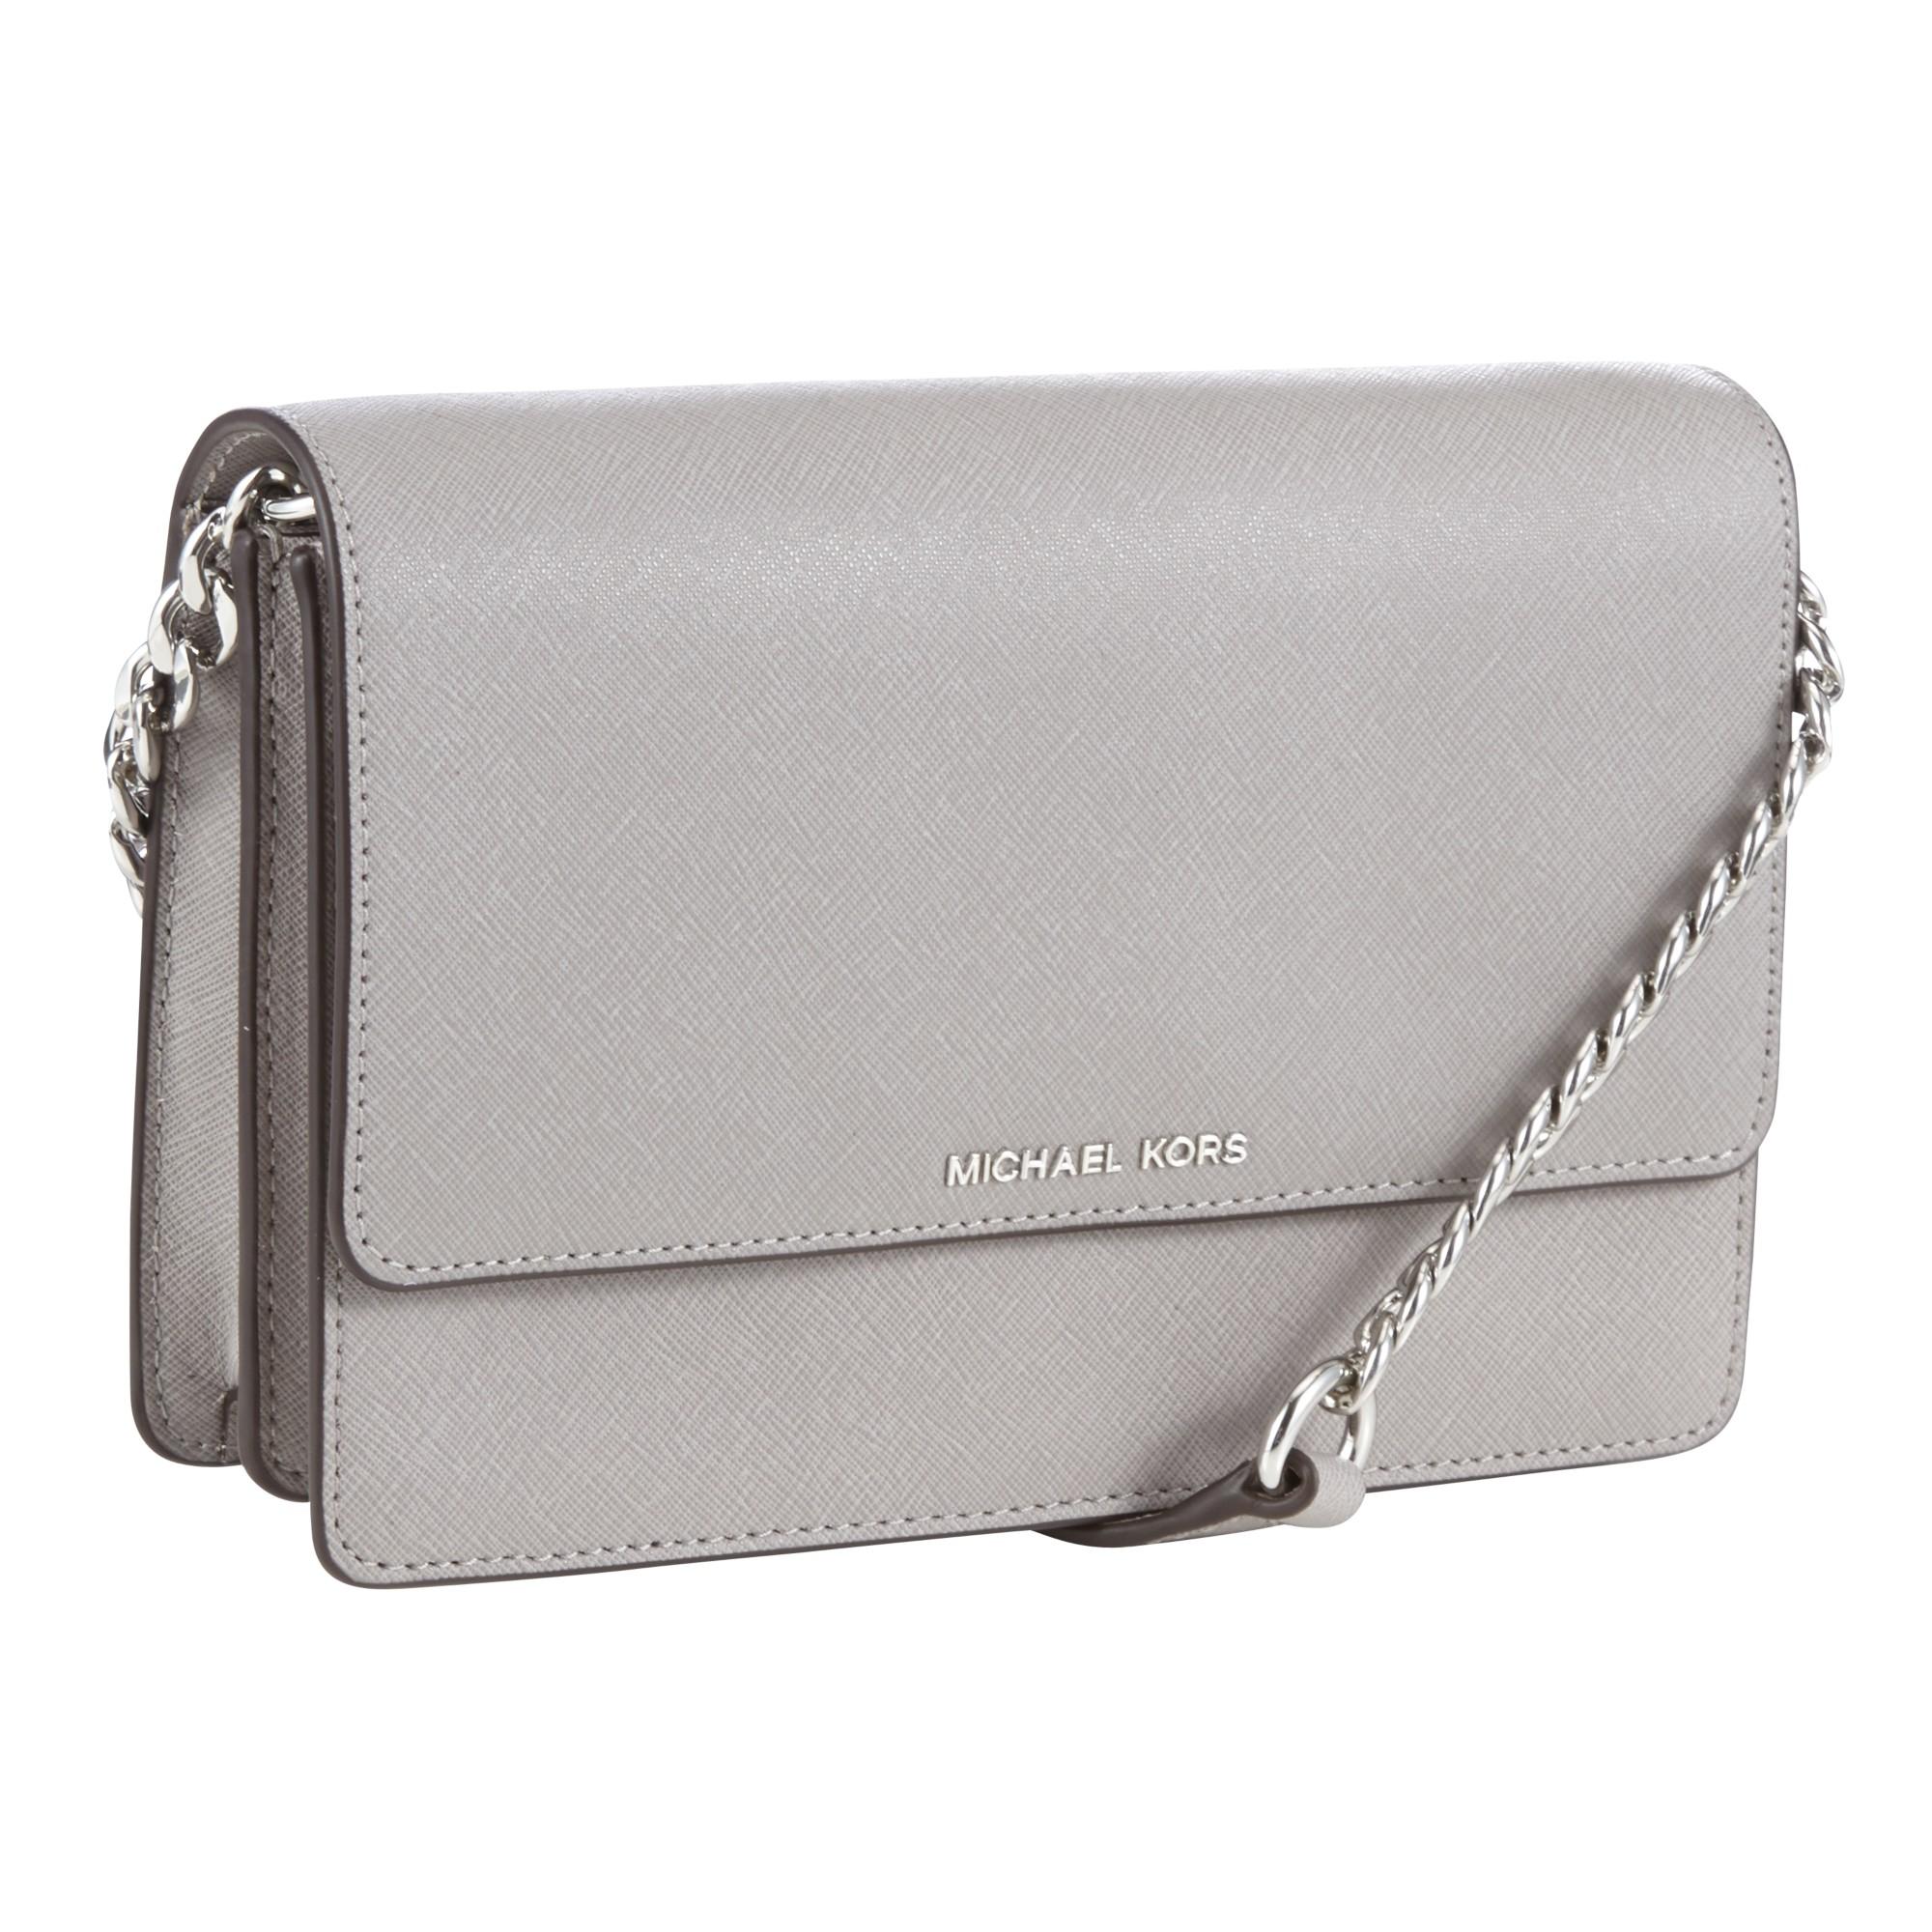 47564b781063 MICHAEL Michael Kors Daniela Small Leather Across Body Bag in Gray ...